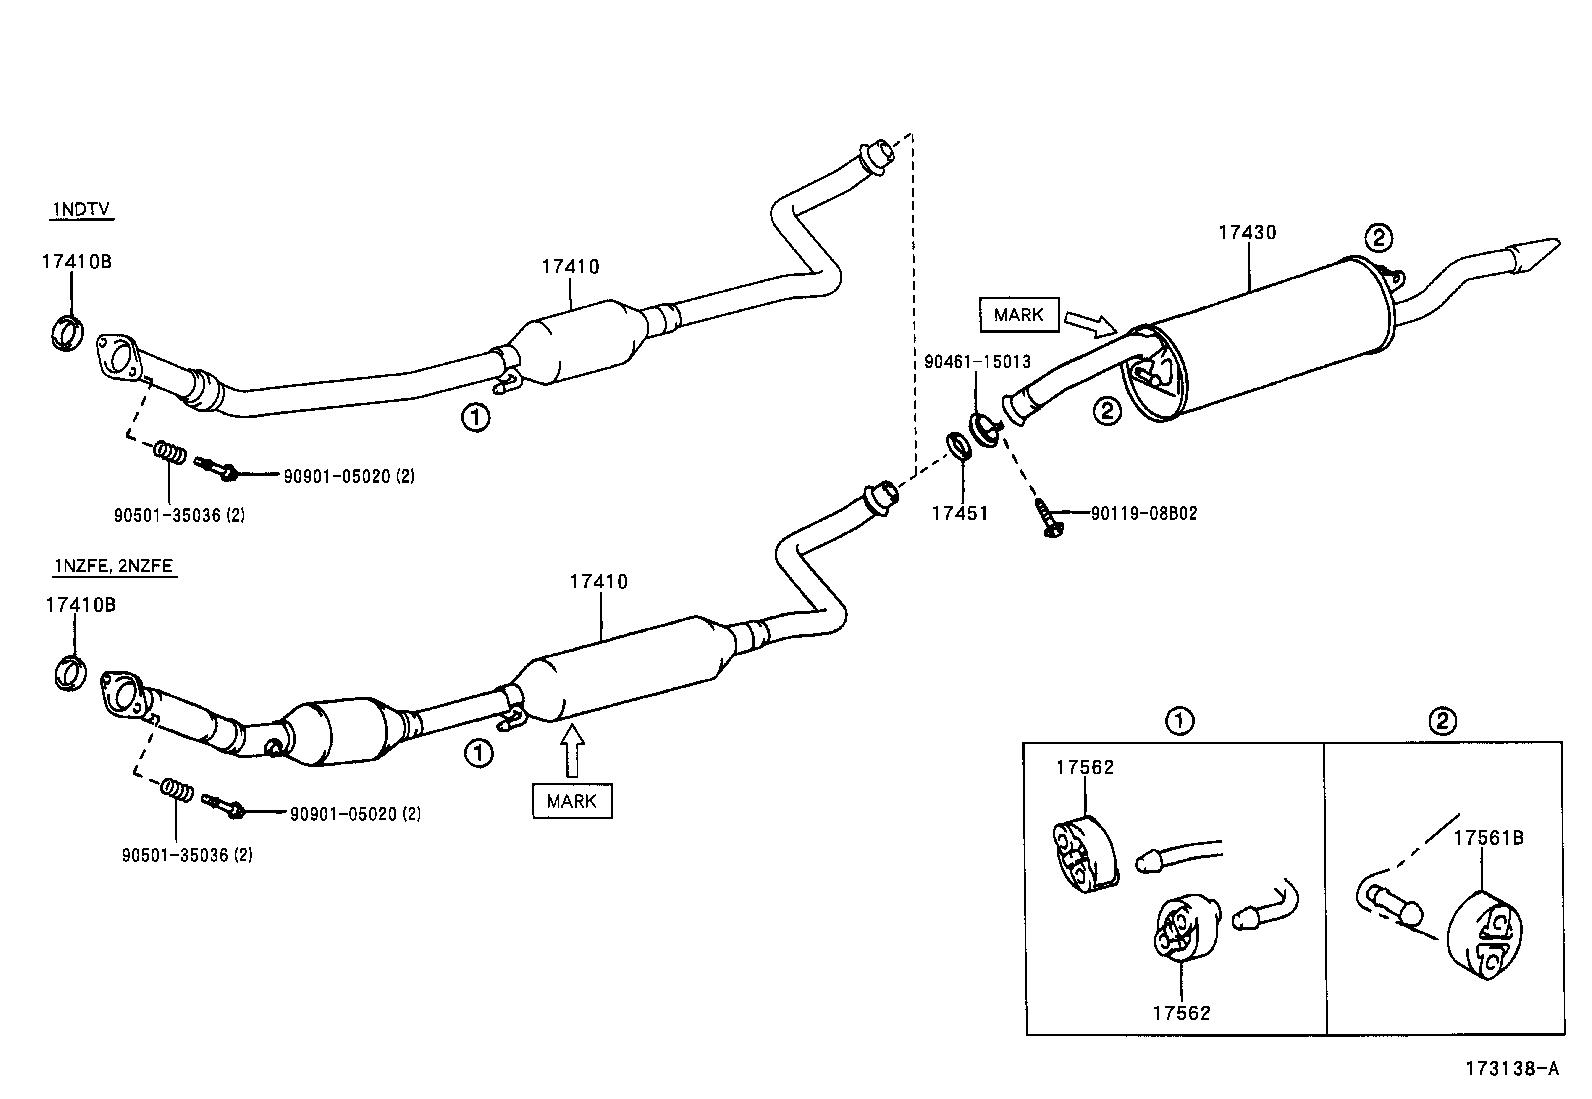 toyota rav4 exhaust system diagram mitsubishi outlander radio wiring 2008 engine best library electrical yaris fuse box